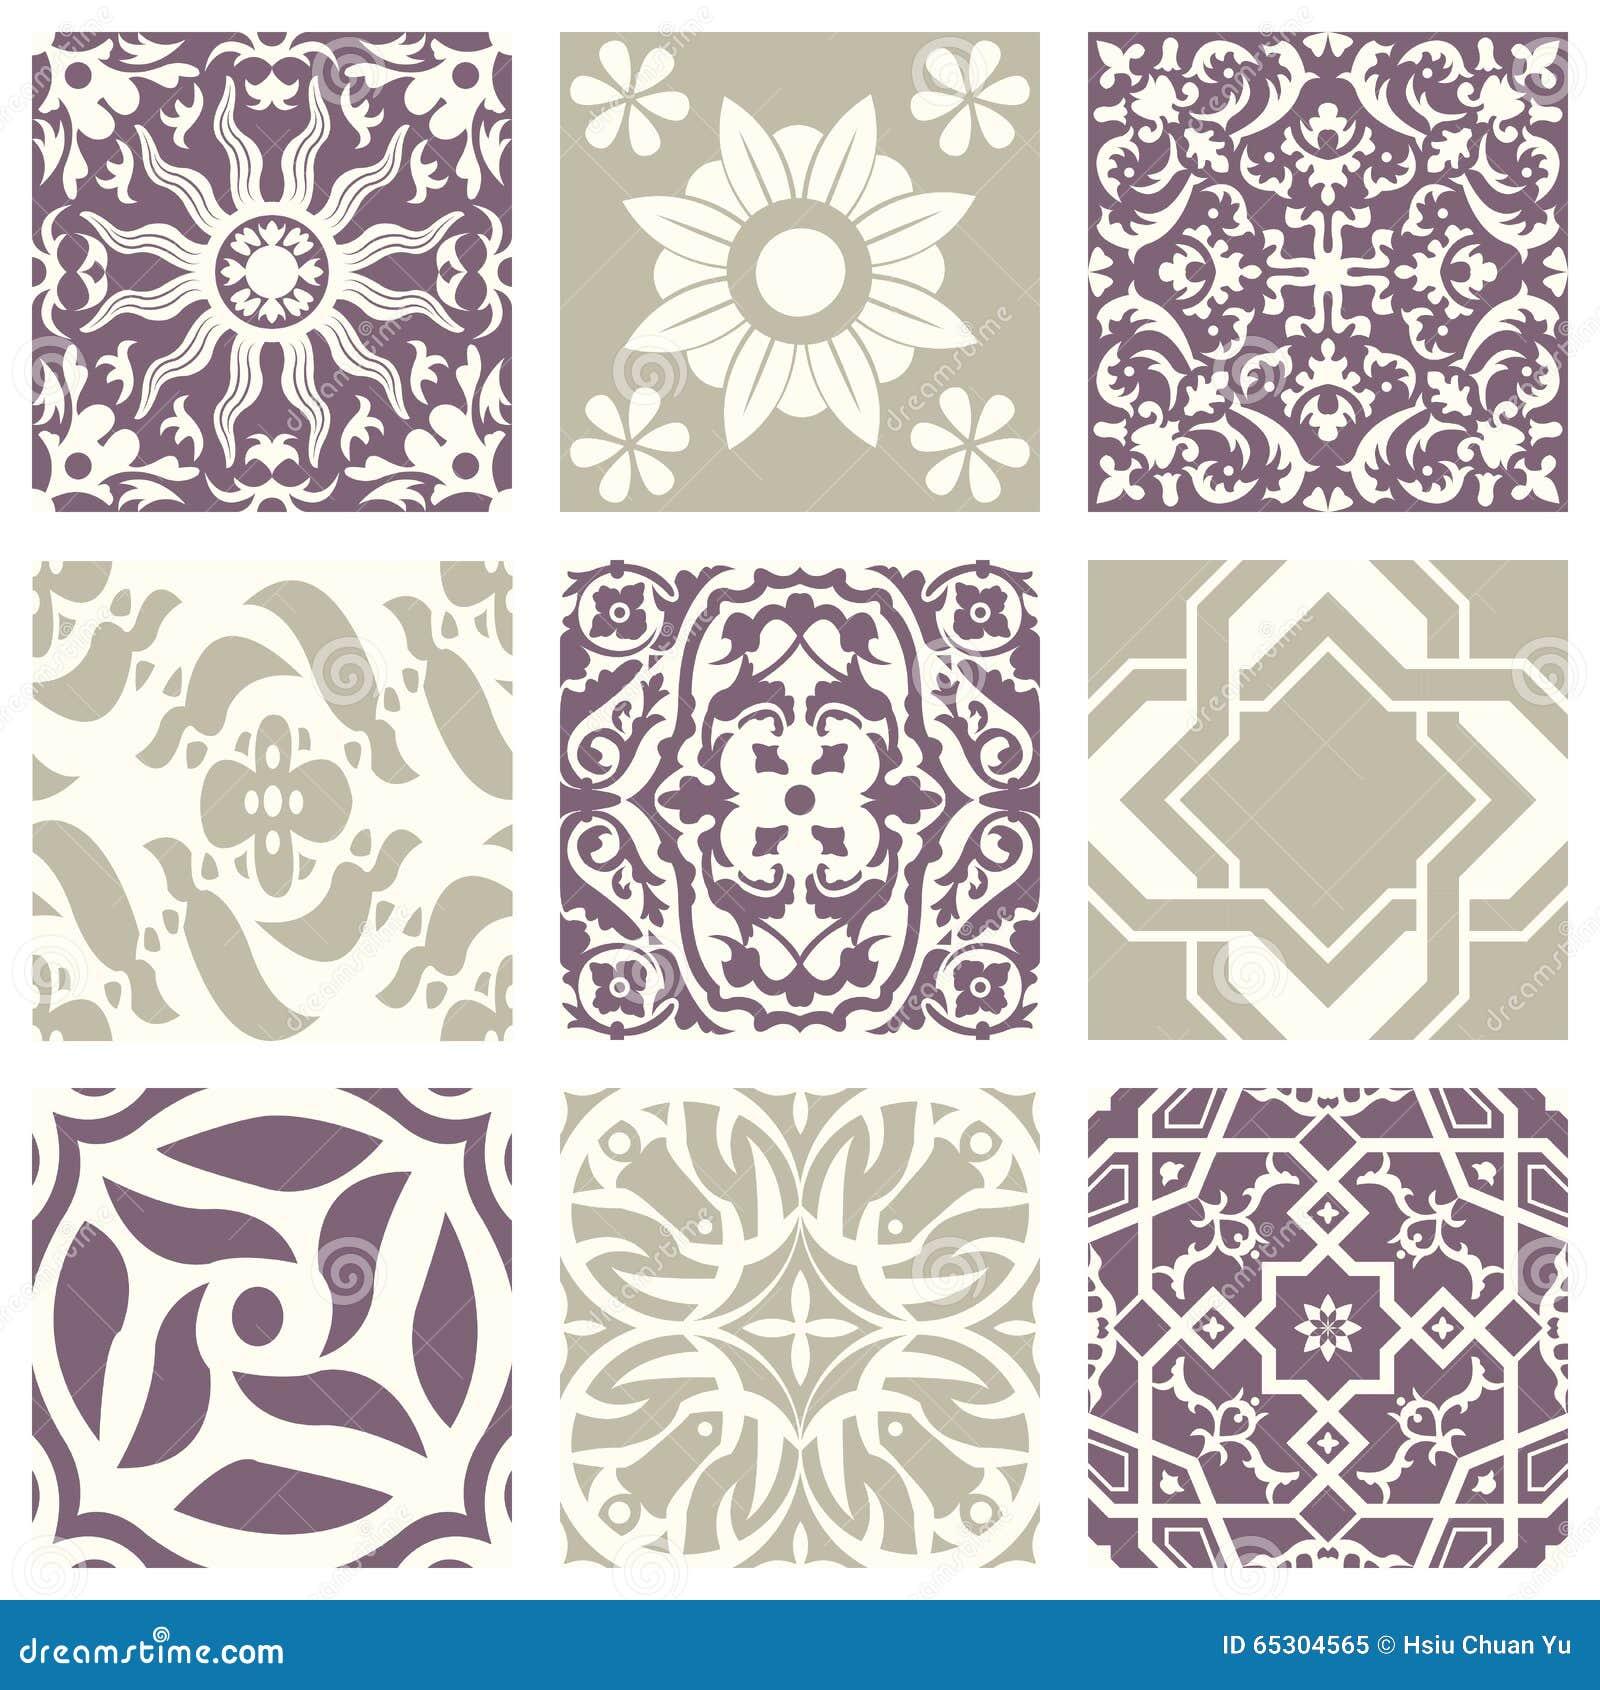 Vintage pastel pattern - photo#28